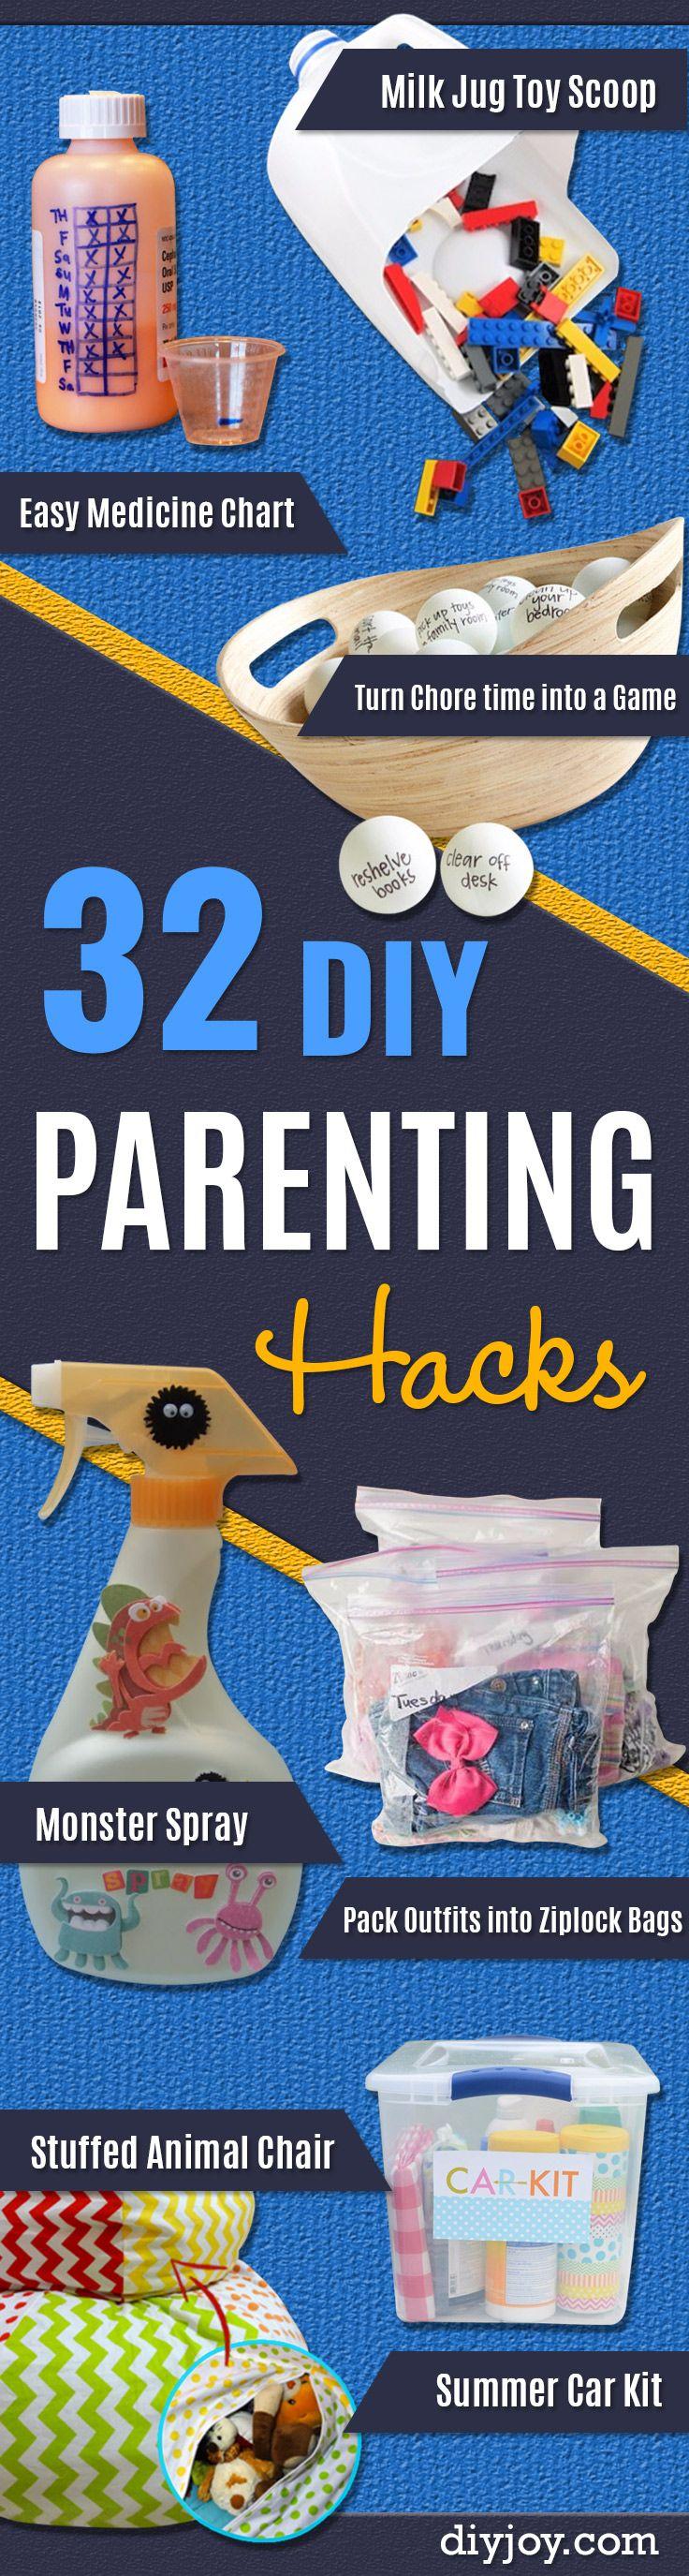 diy parenting hacks youull wish you knew of sooner parents